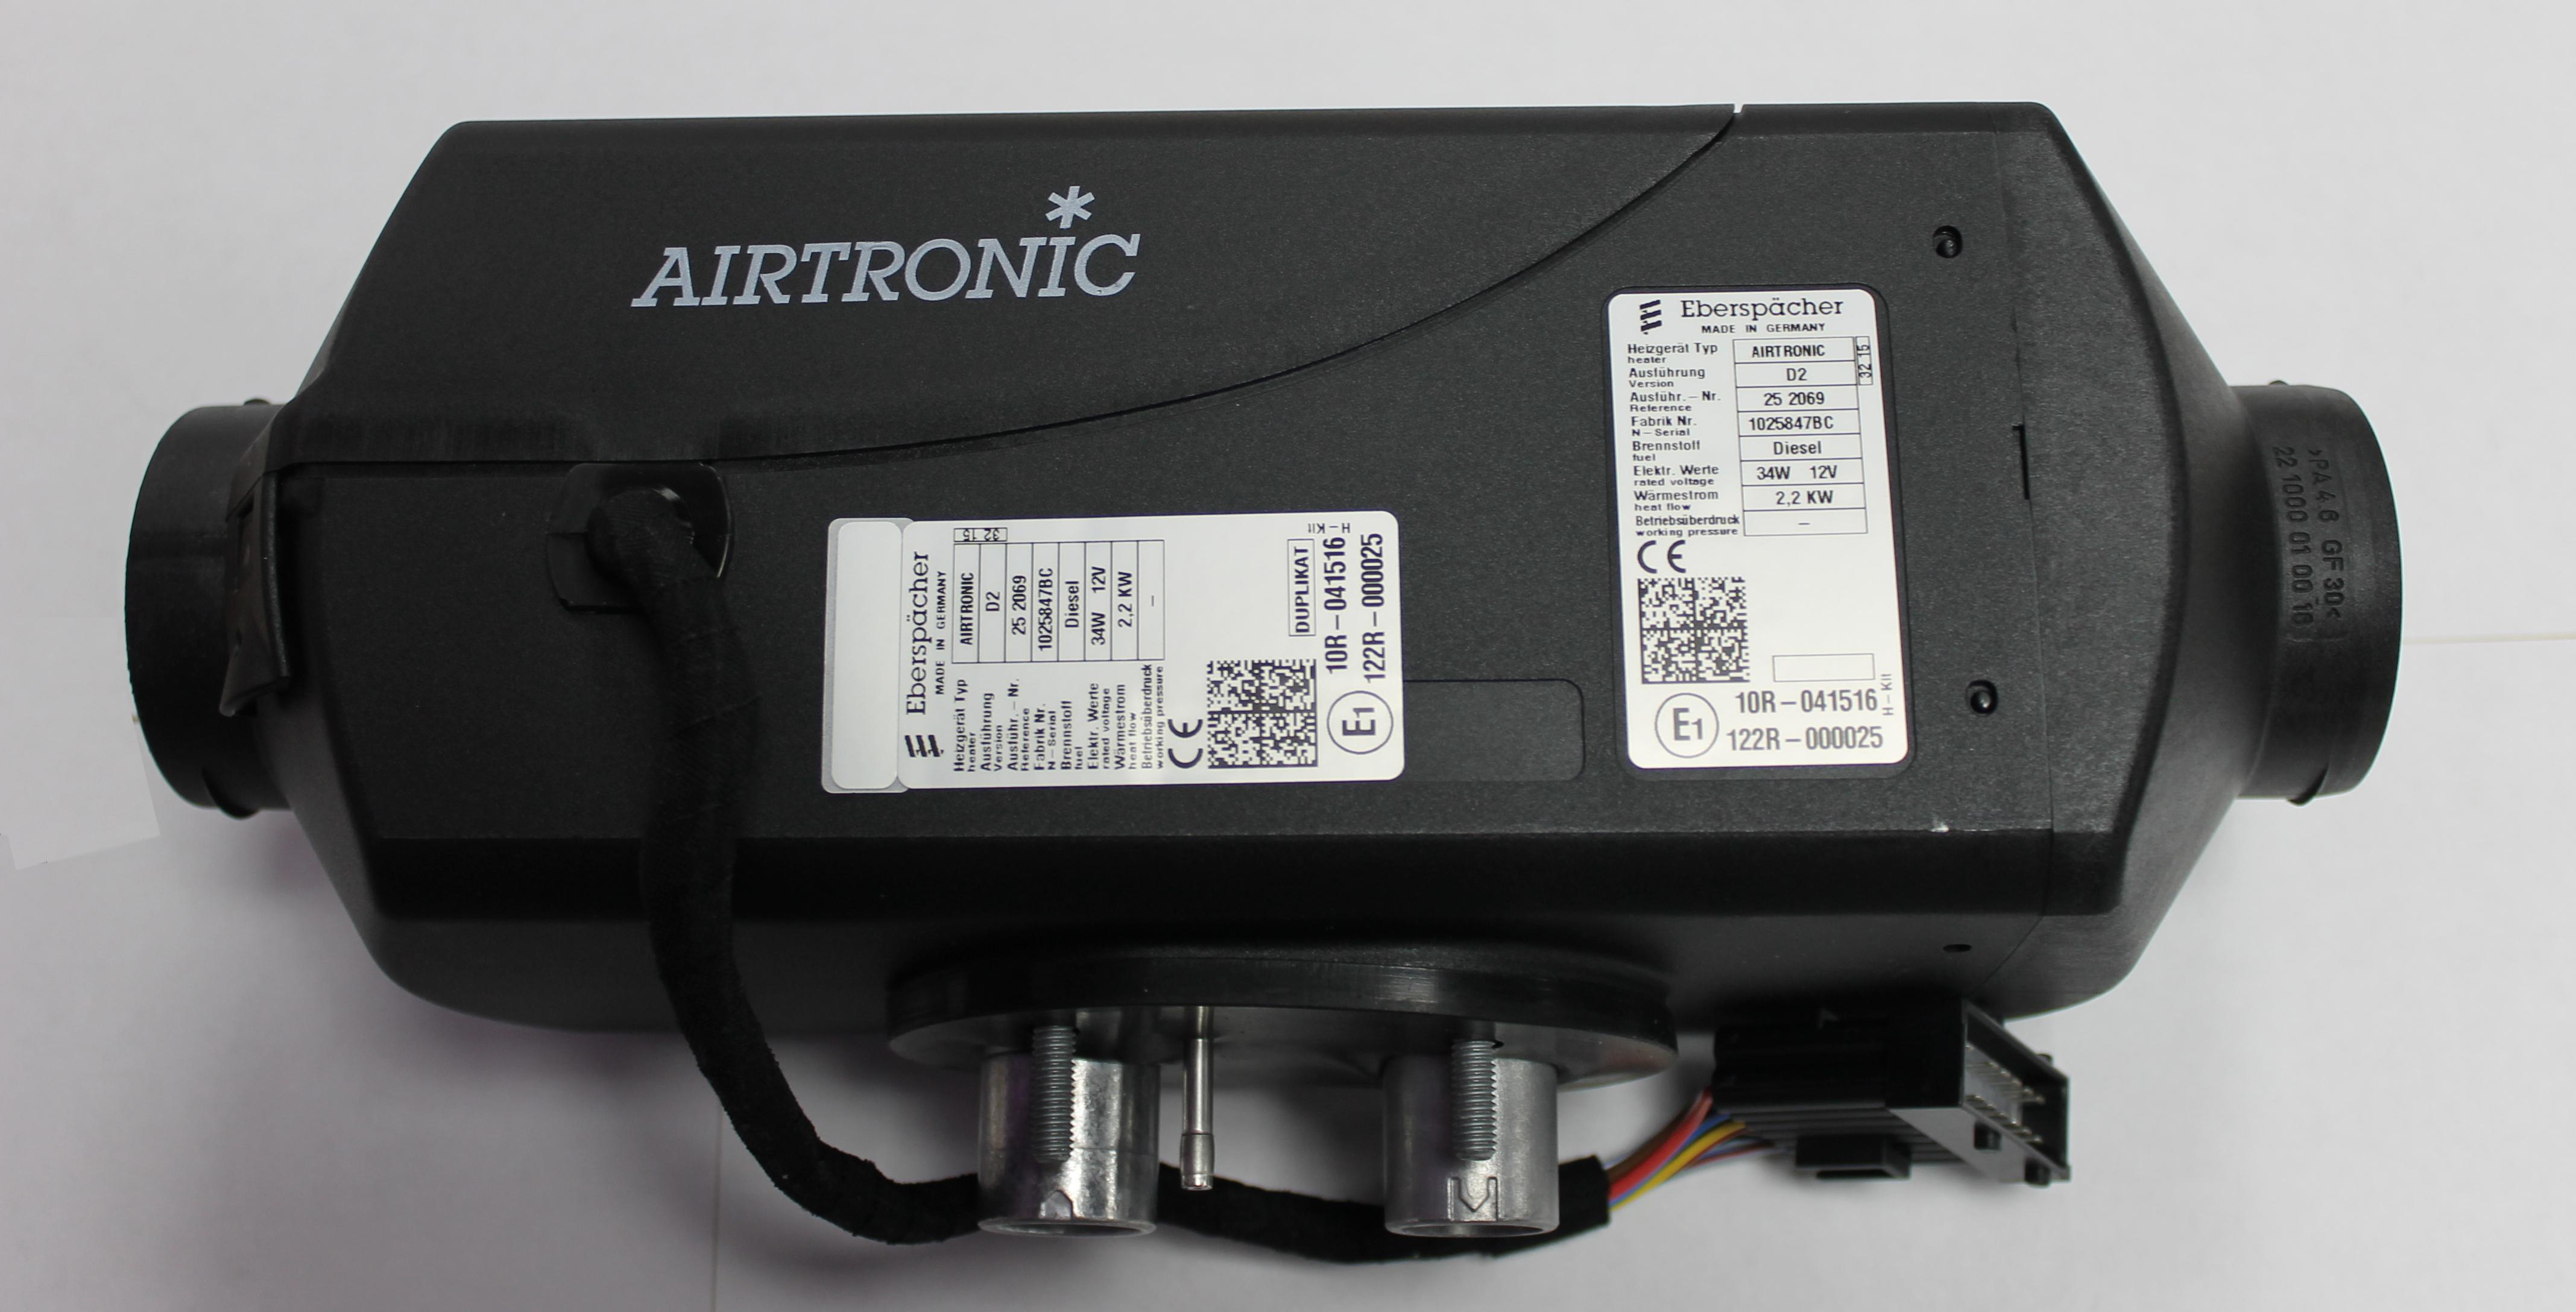 eberspacher airtronic d2 24v